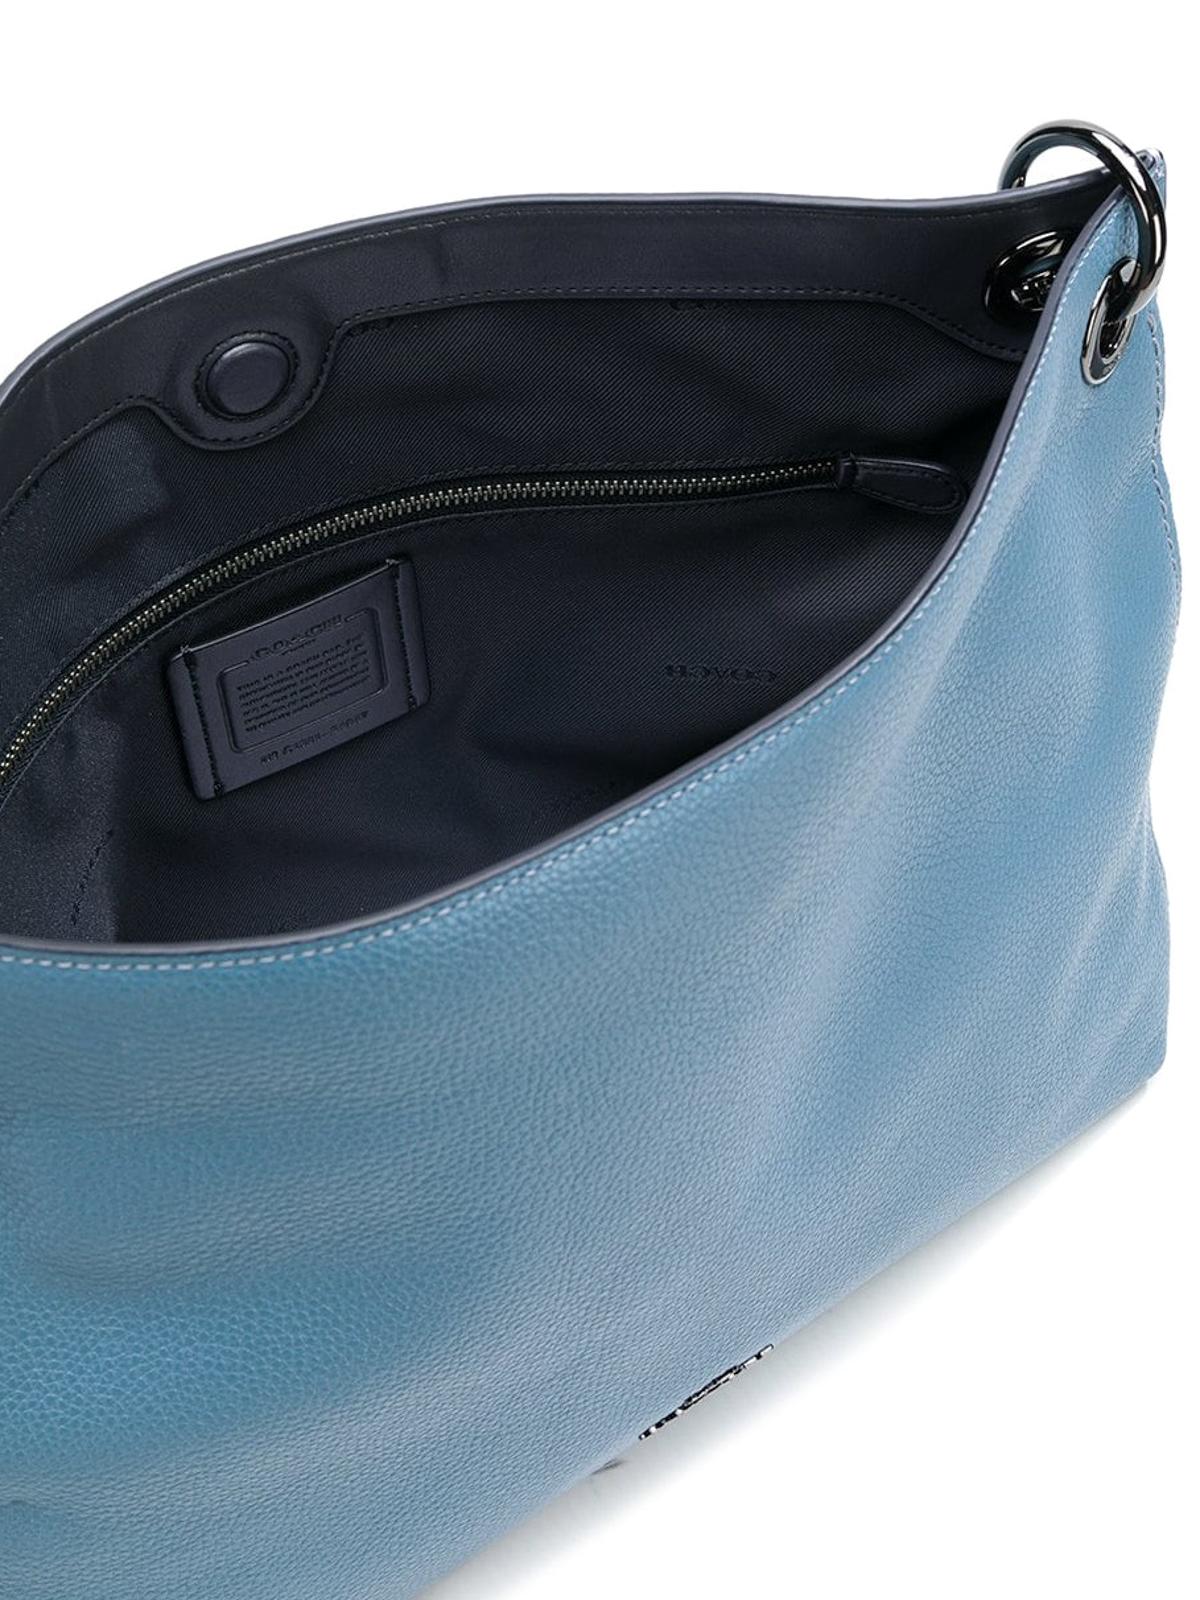 7c3c358378e4 Coach - Clarkson chambray leather hobo bag - shoulder bags - 24947DKCMB